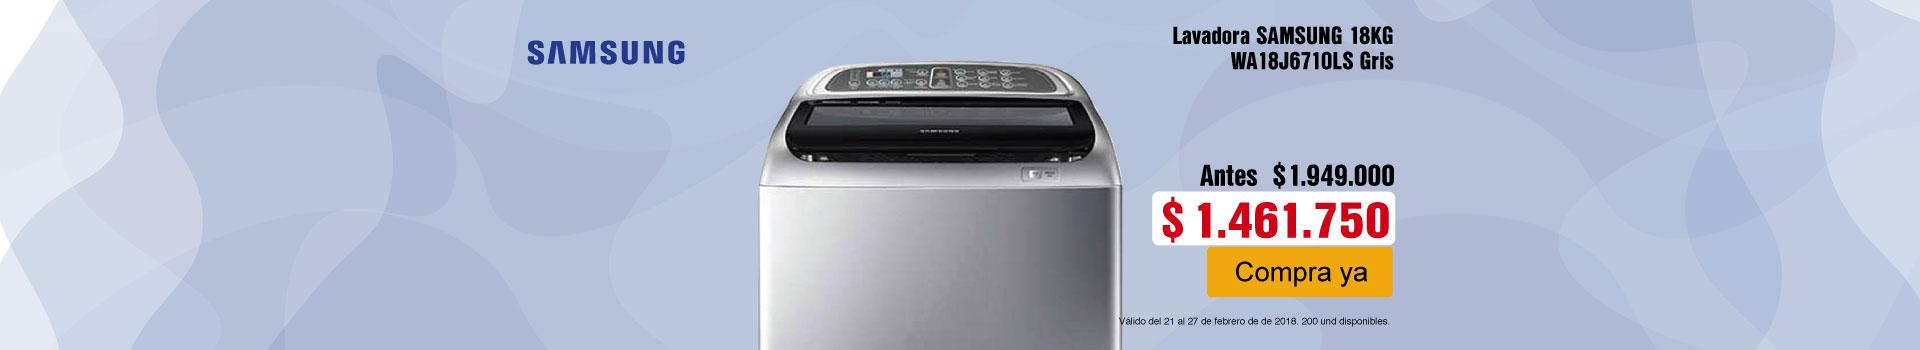 CAT LAV-AKyKT-1-lb-lavadora-samsung-18kg-wa18j6710ls-prod-febrero21-23